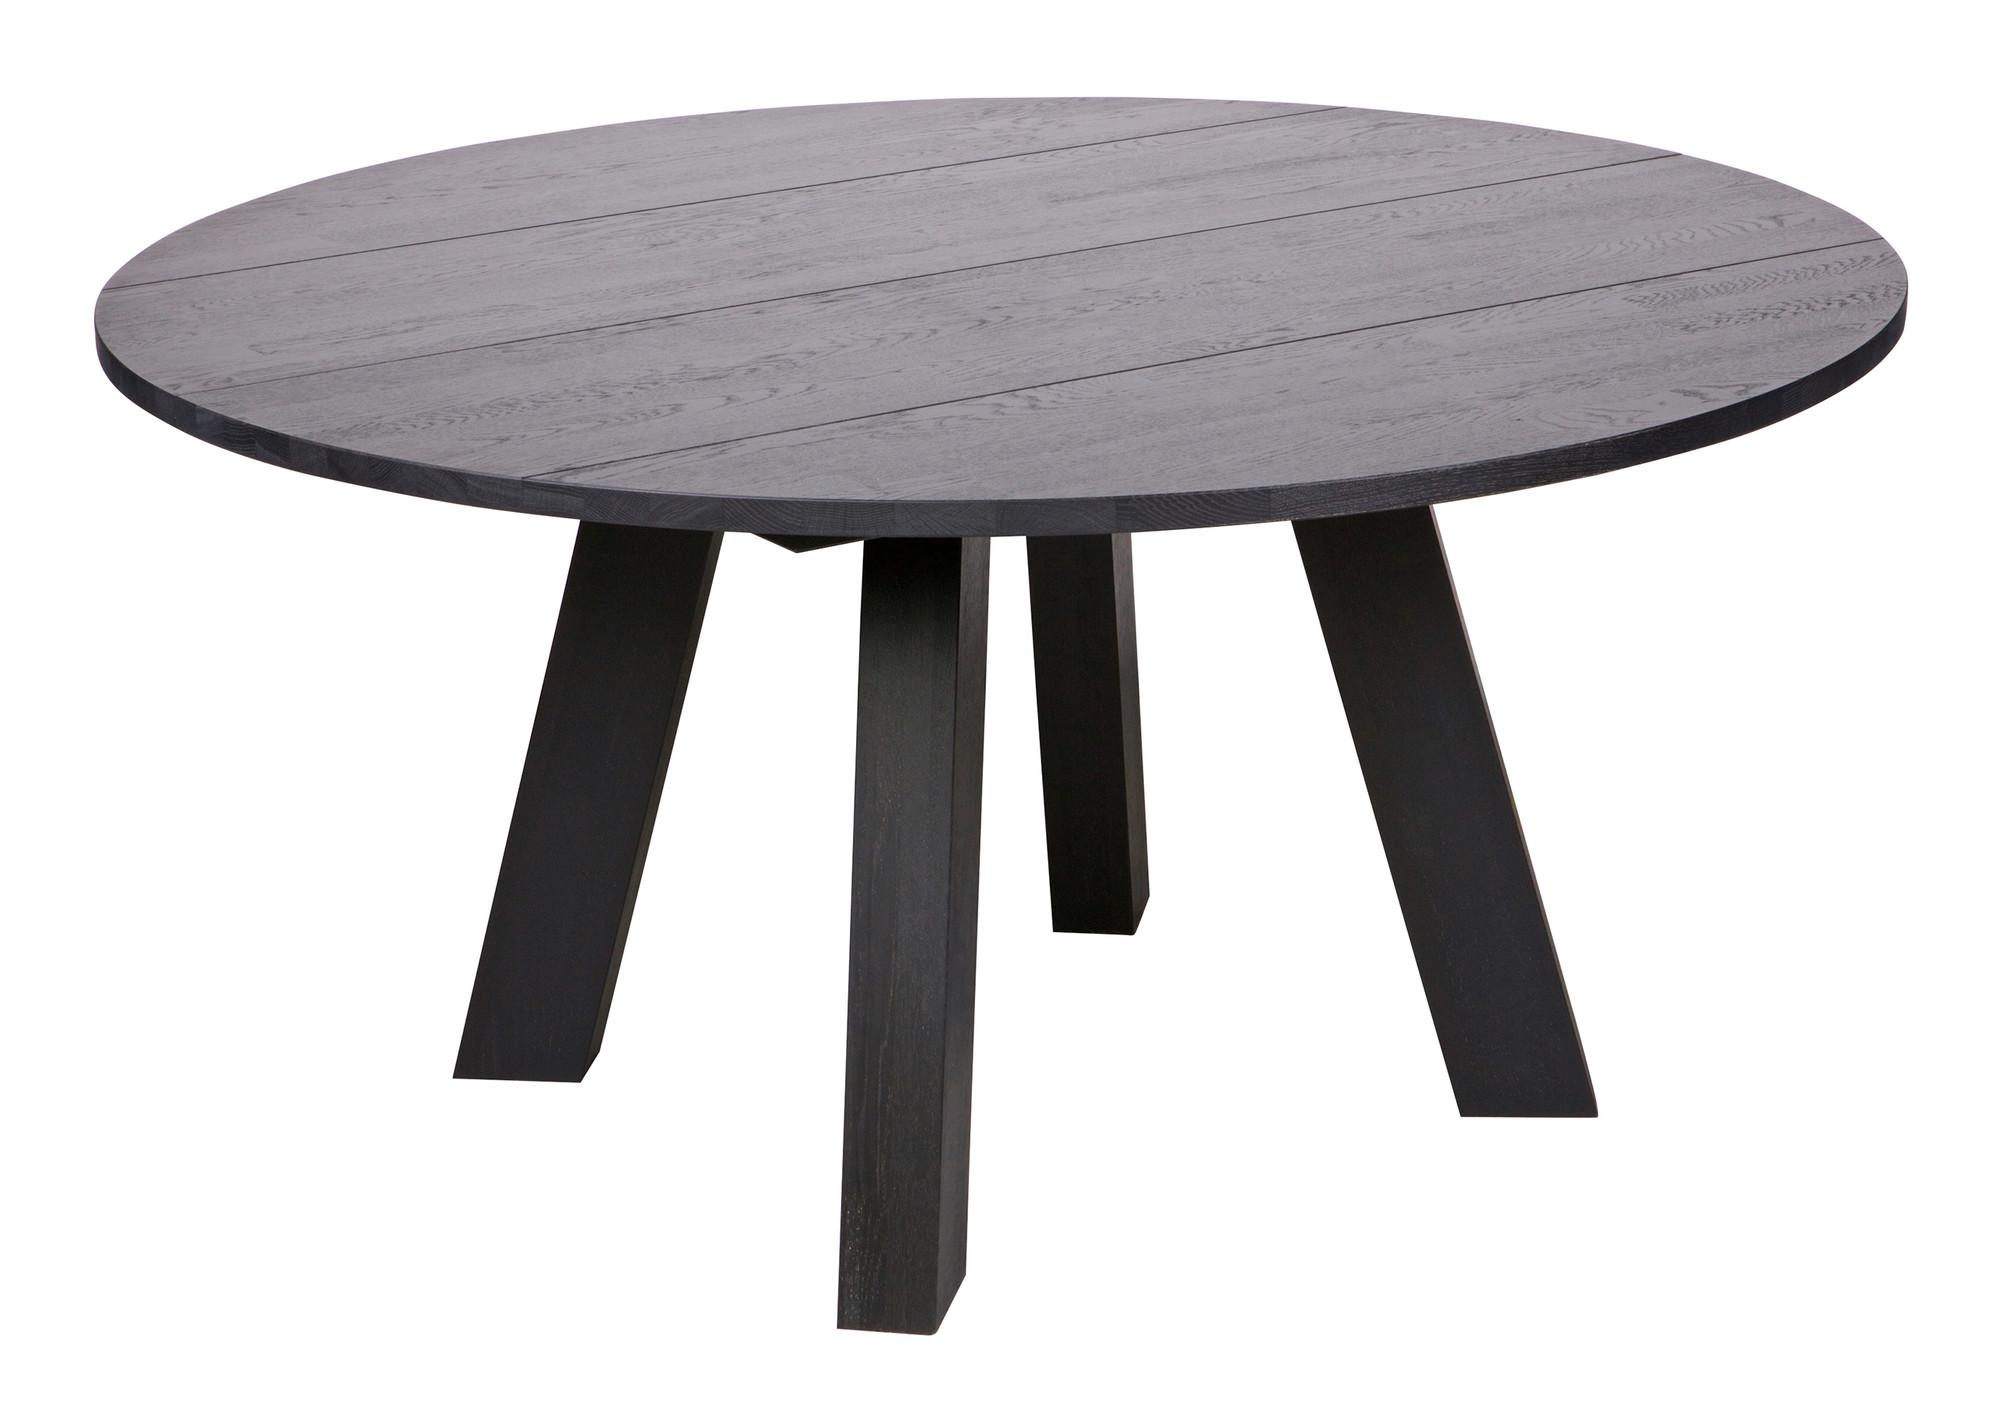 Woood Ronde Tafel : Woood ronde eettafel rhonda xl eiken cm kleur zwart